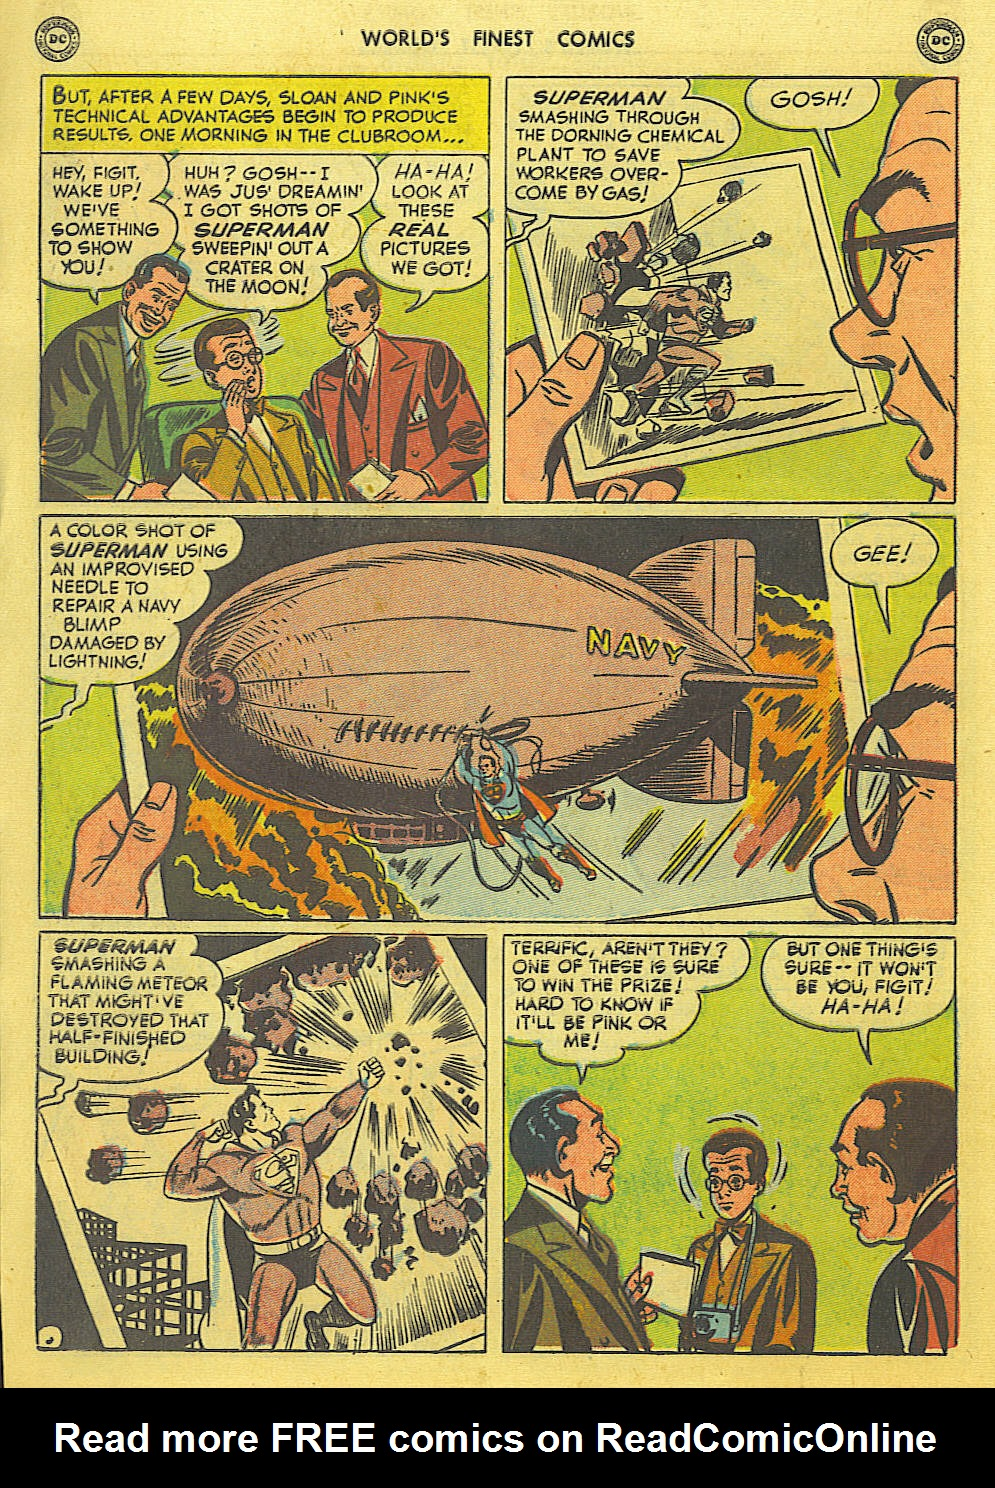 Read online World's Finest Comics comic -  Issue #49 - 9